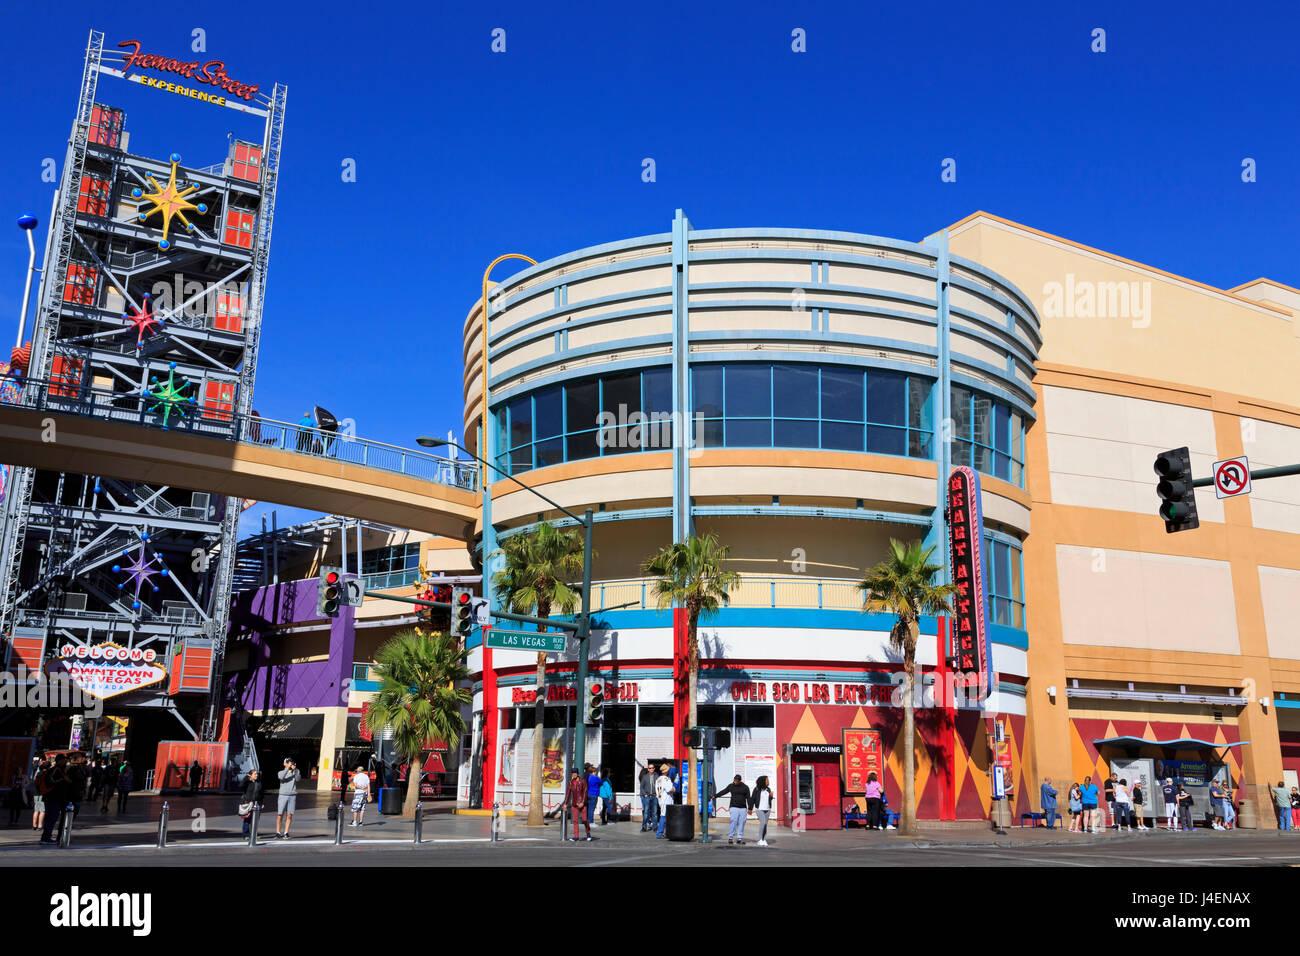 Fremont Street, Las Vegas, Nevada, Vereinigte Staaten von Amerika, Nordamerika Stockfoto